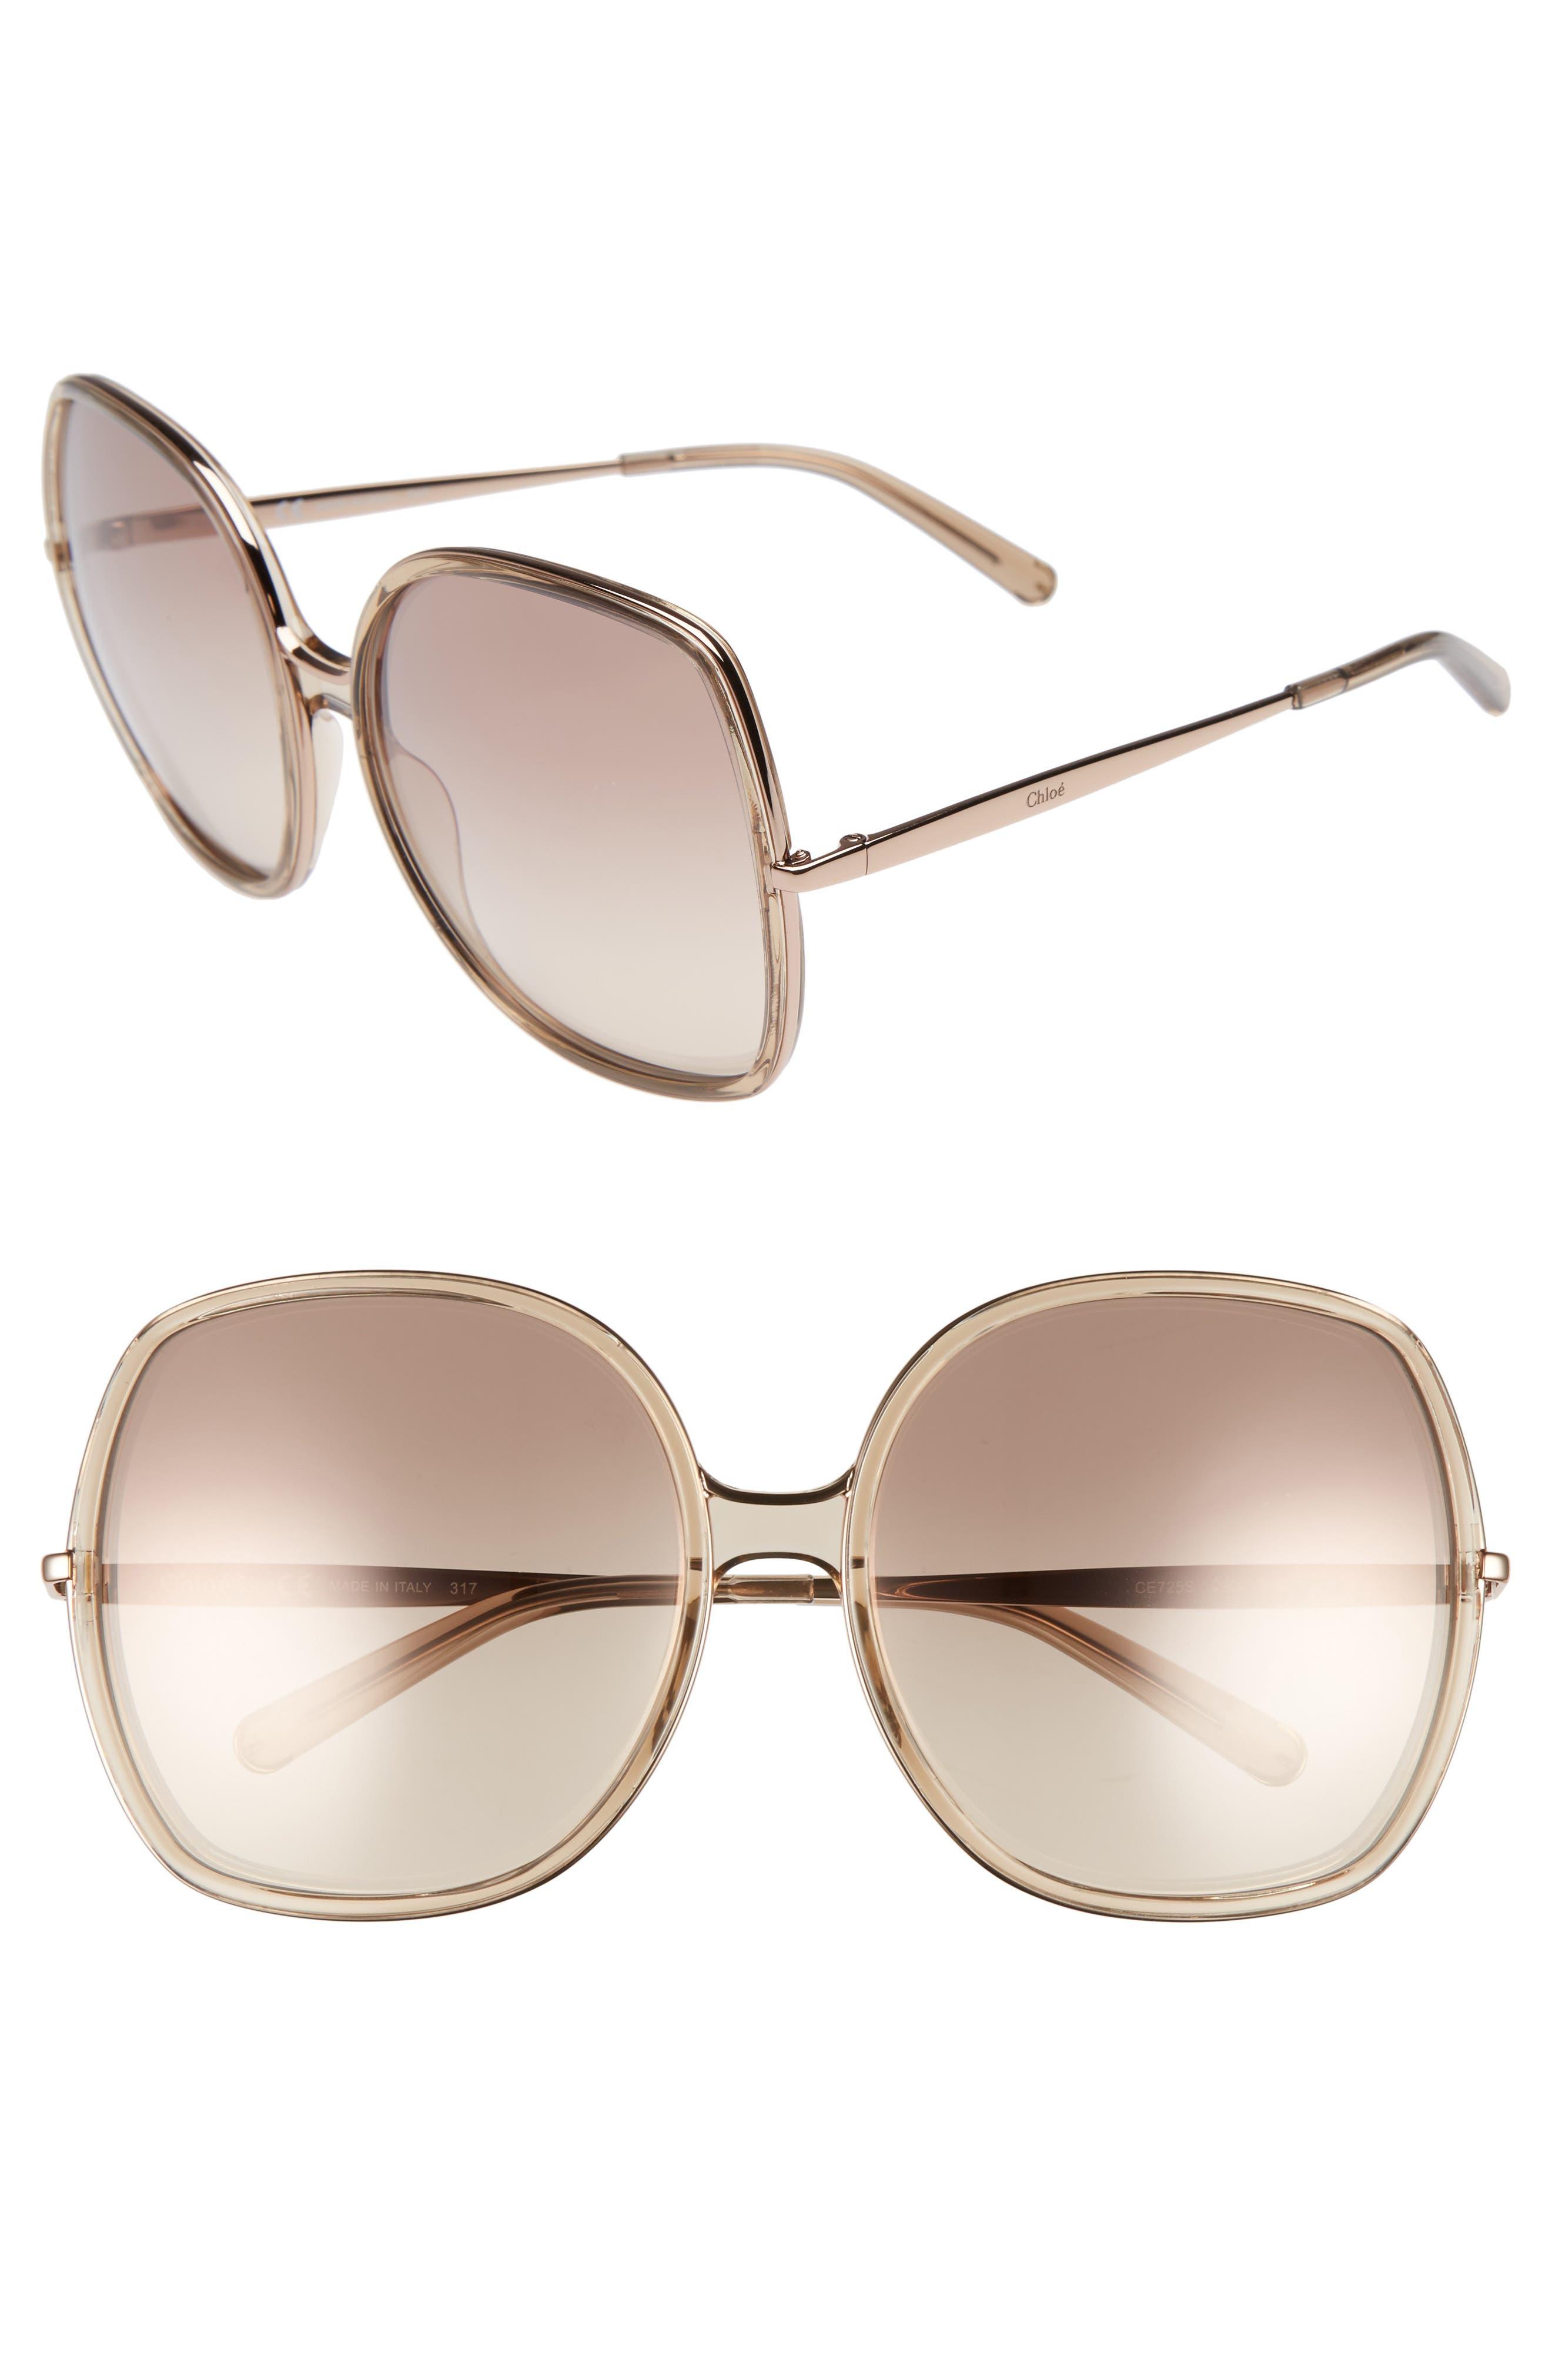 62mm Oversized Gradient Lens Square Sunglasses,                         Main,                         color, Nude